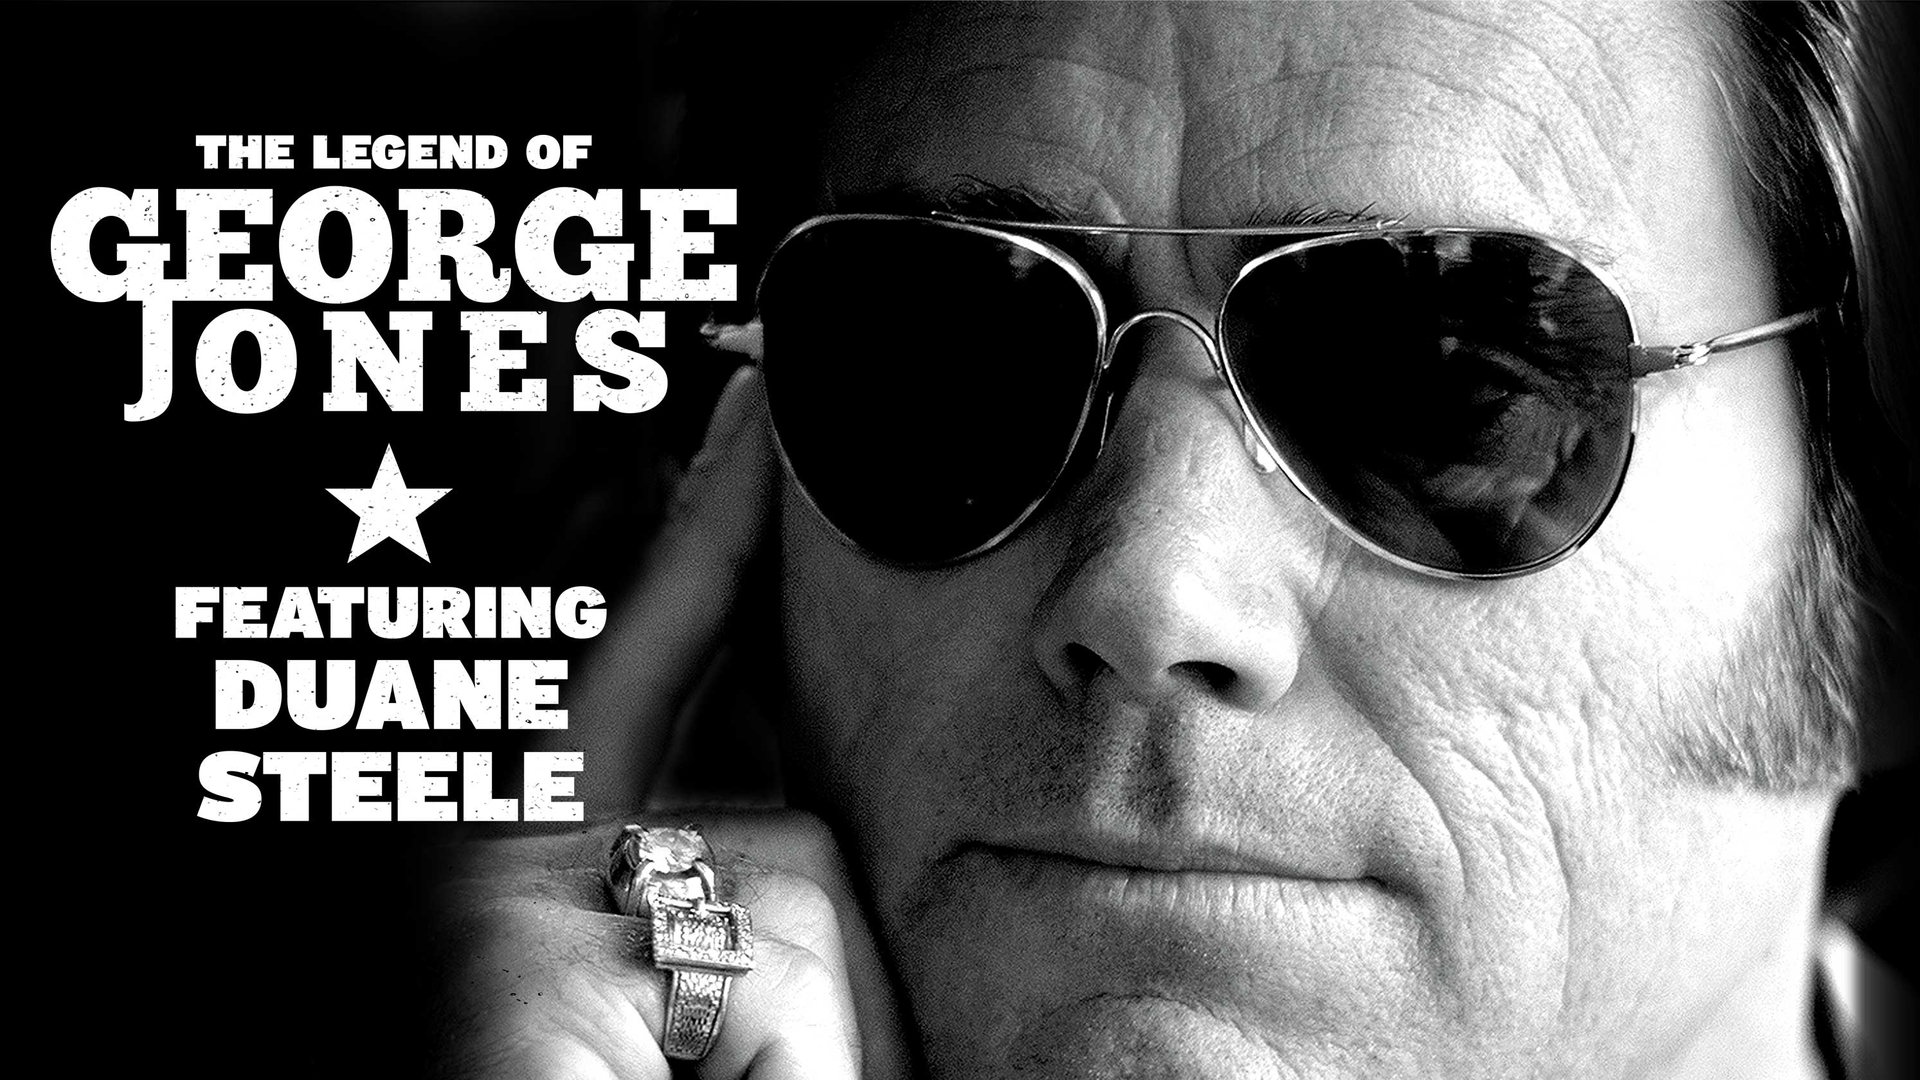 Book The Legend Of George Jones featuring Duane Steele